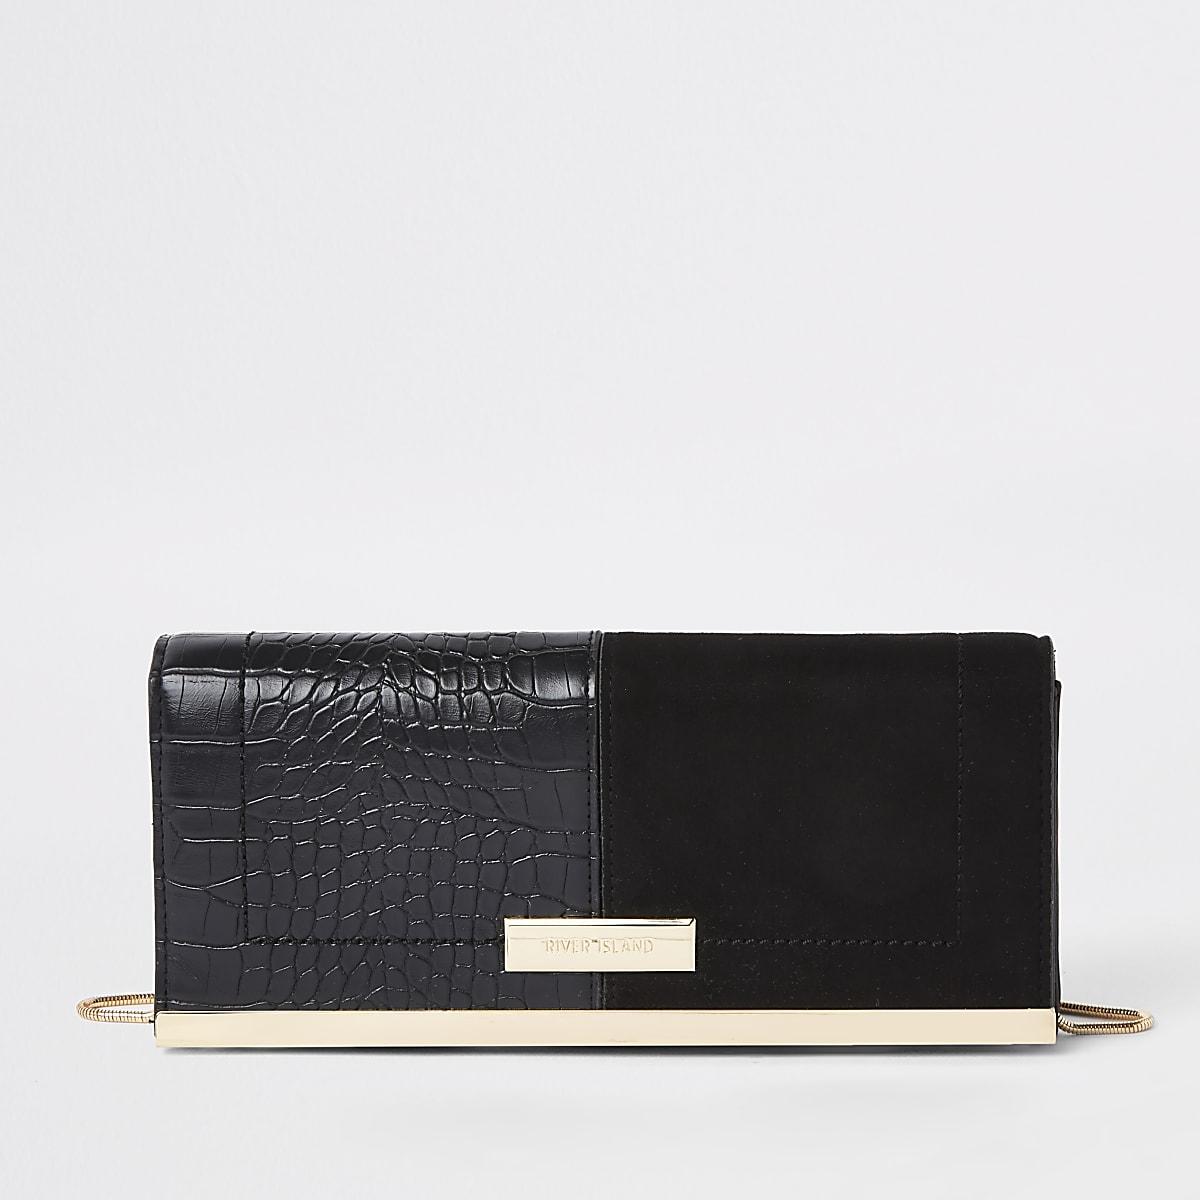 edbd46fca Black faux suede croc embossed clutch bag - Clutch Bags - Bags & Purses -  women